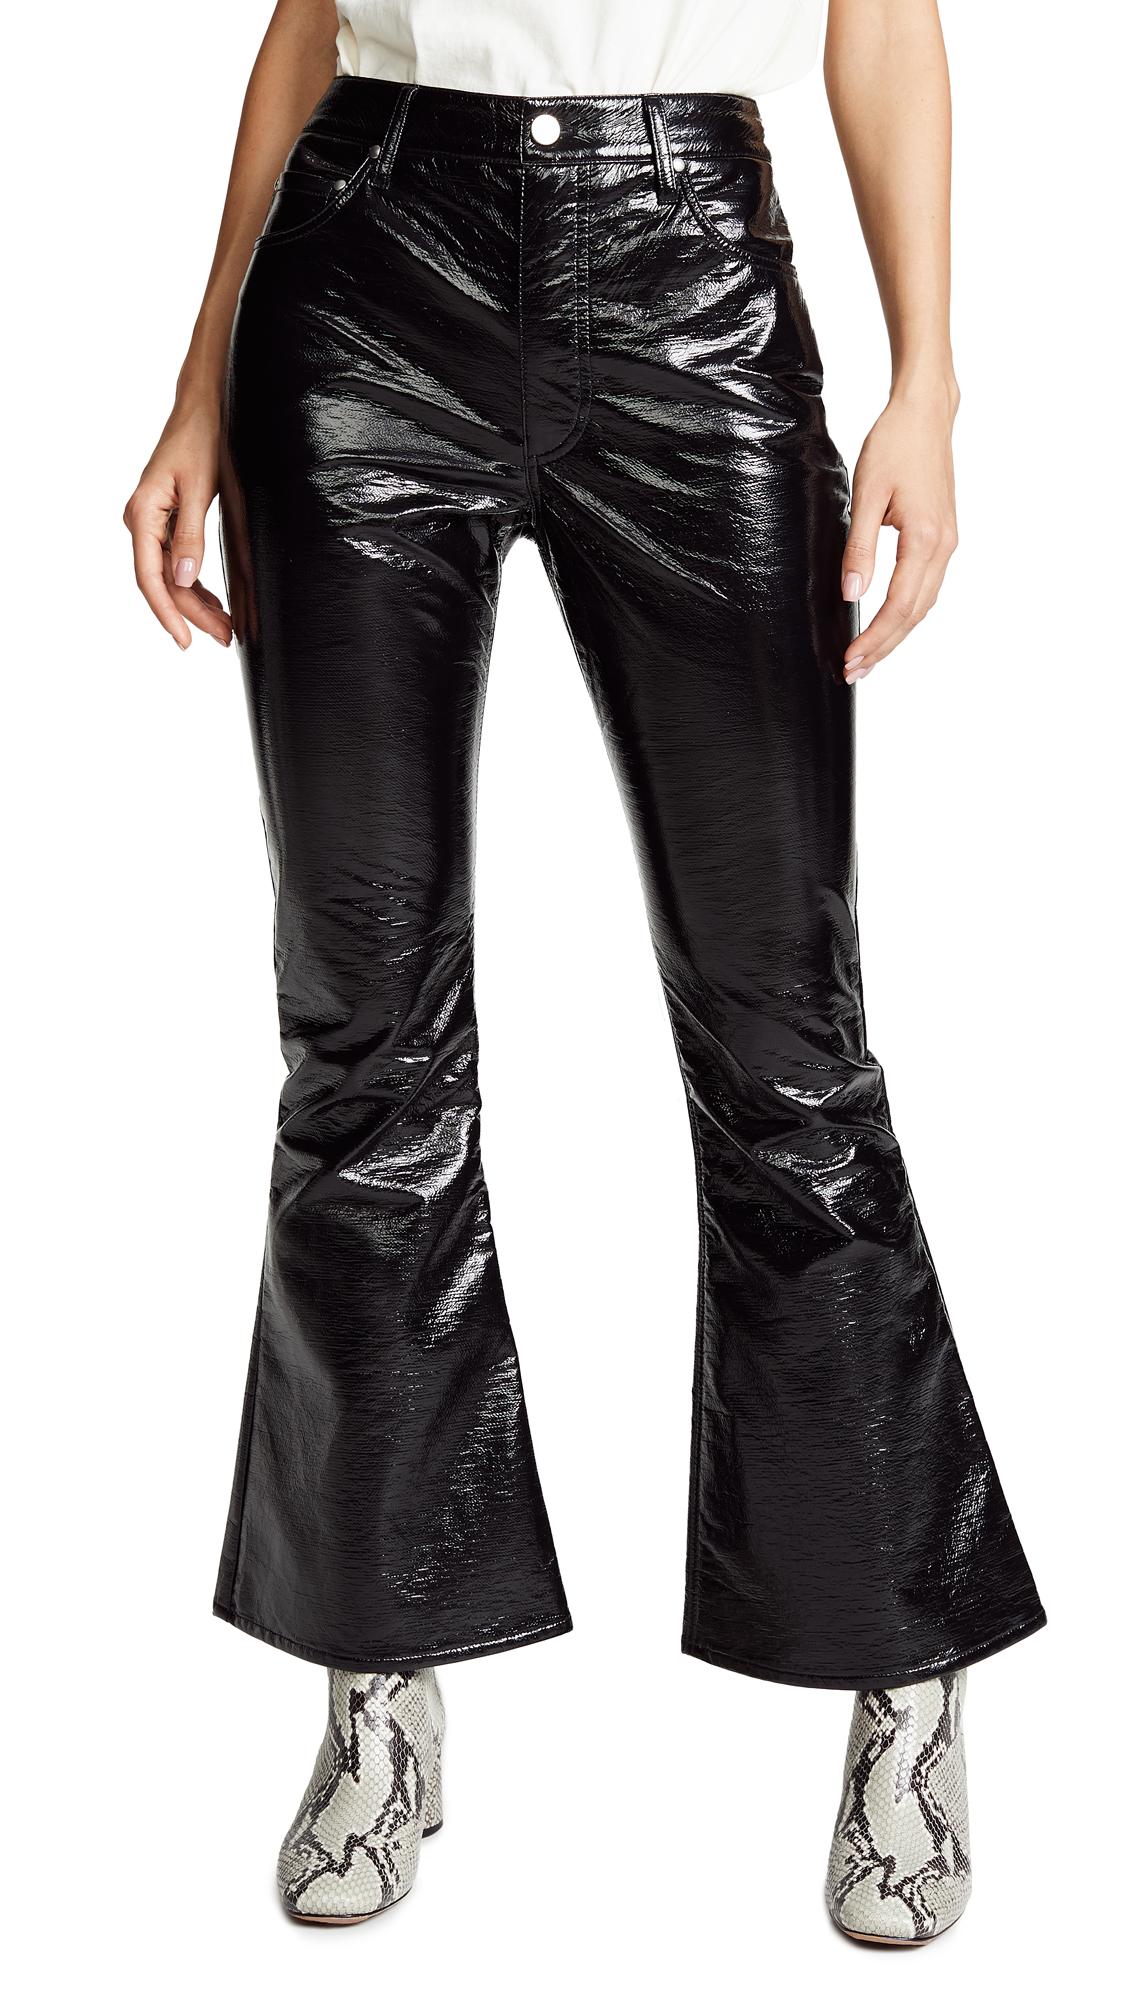 Beaufille Veritas Trousers In Black